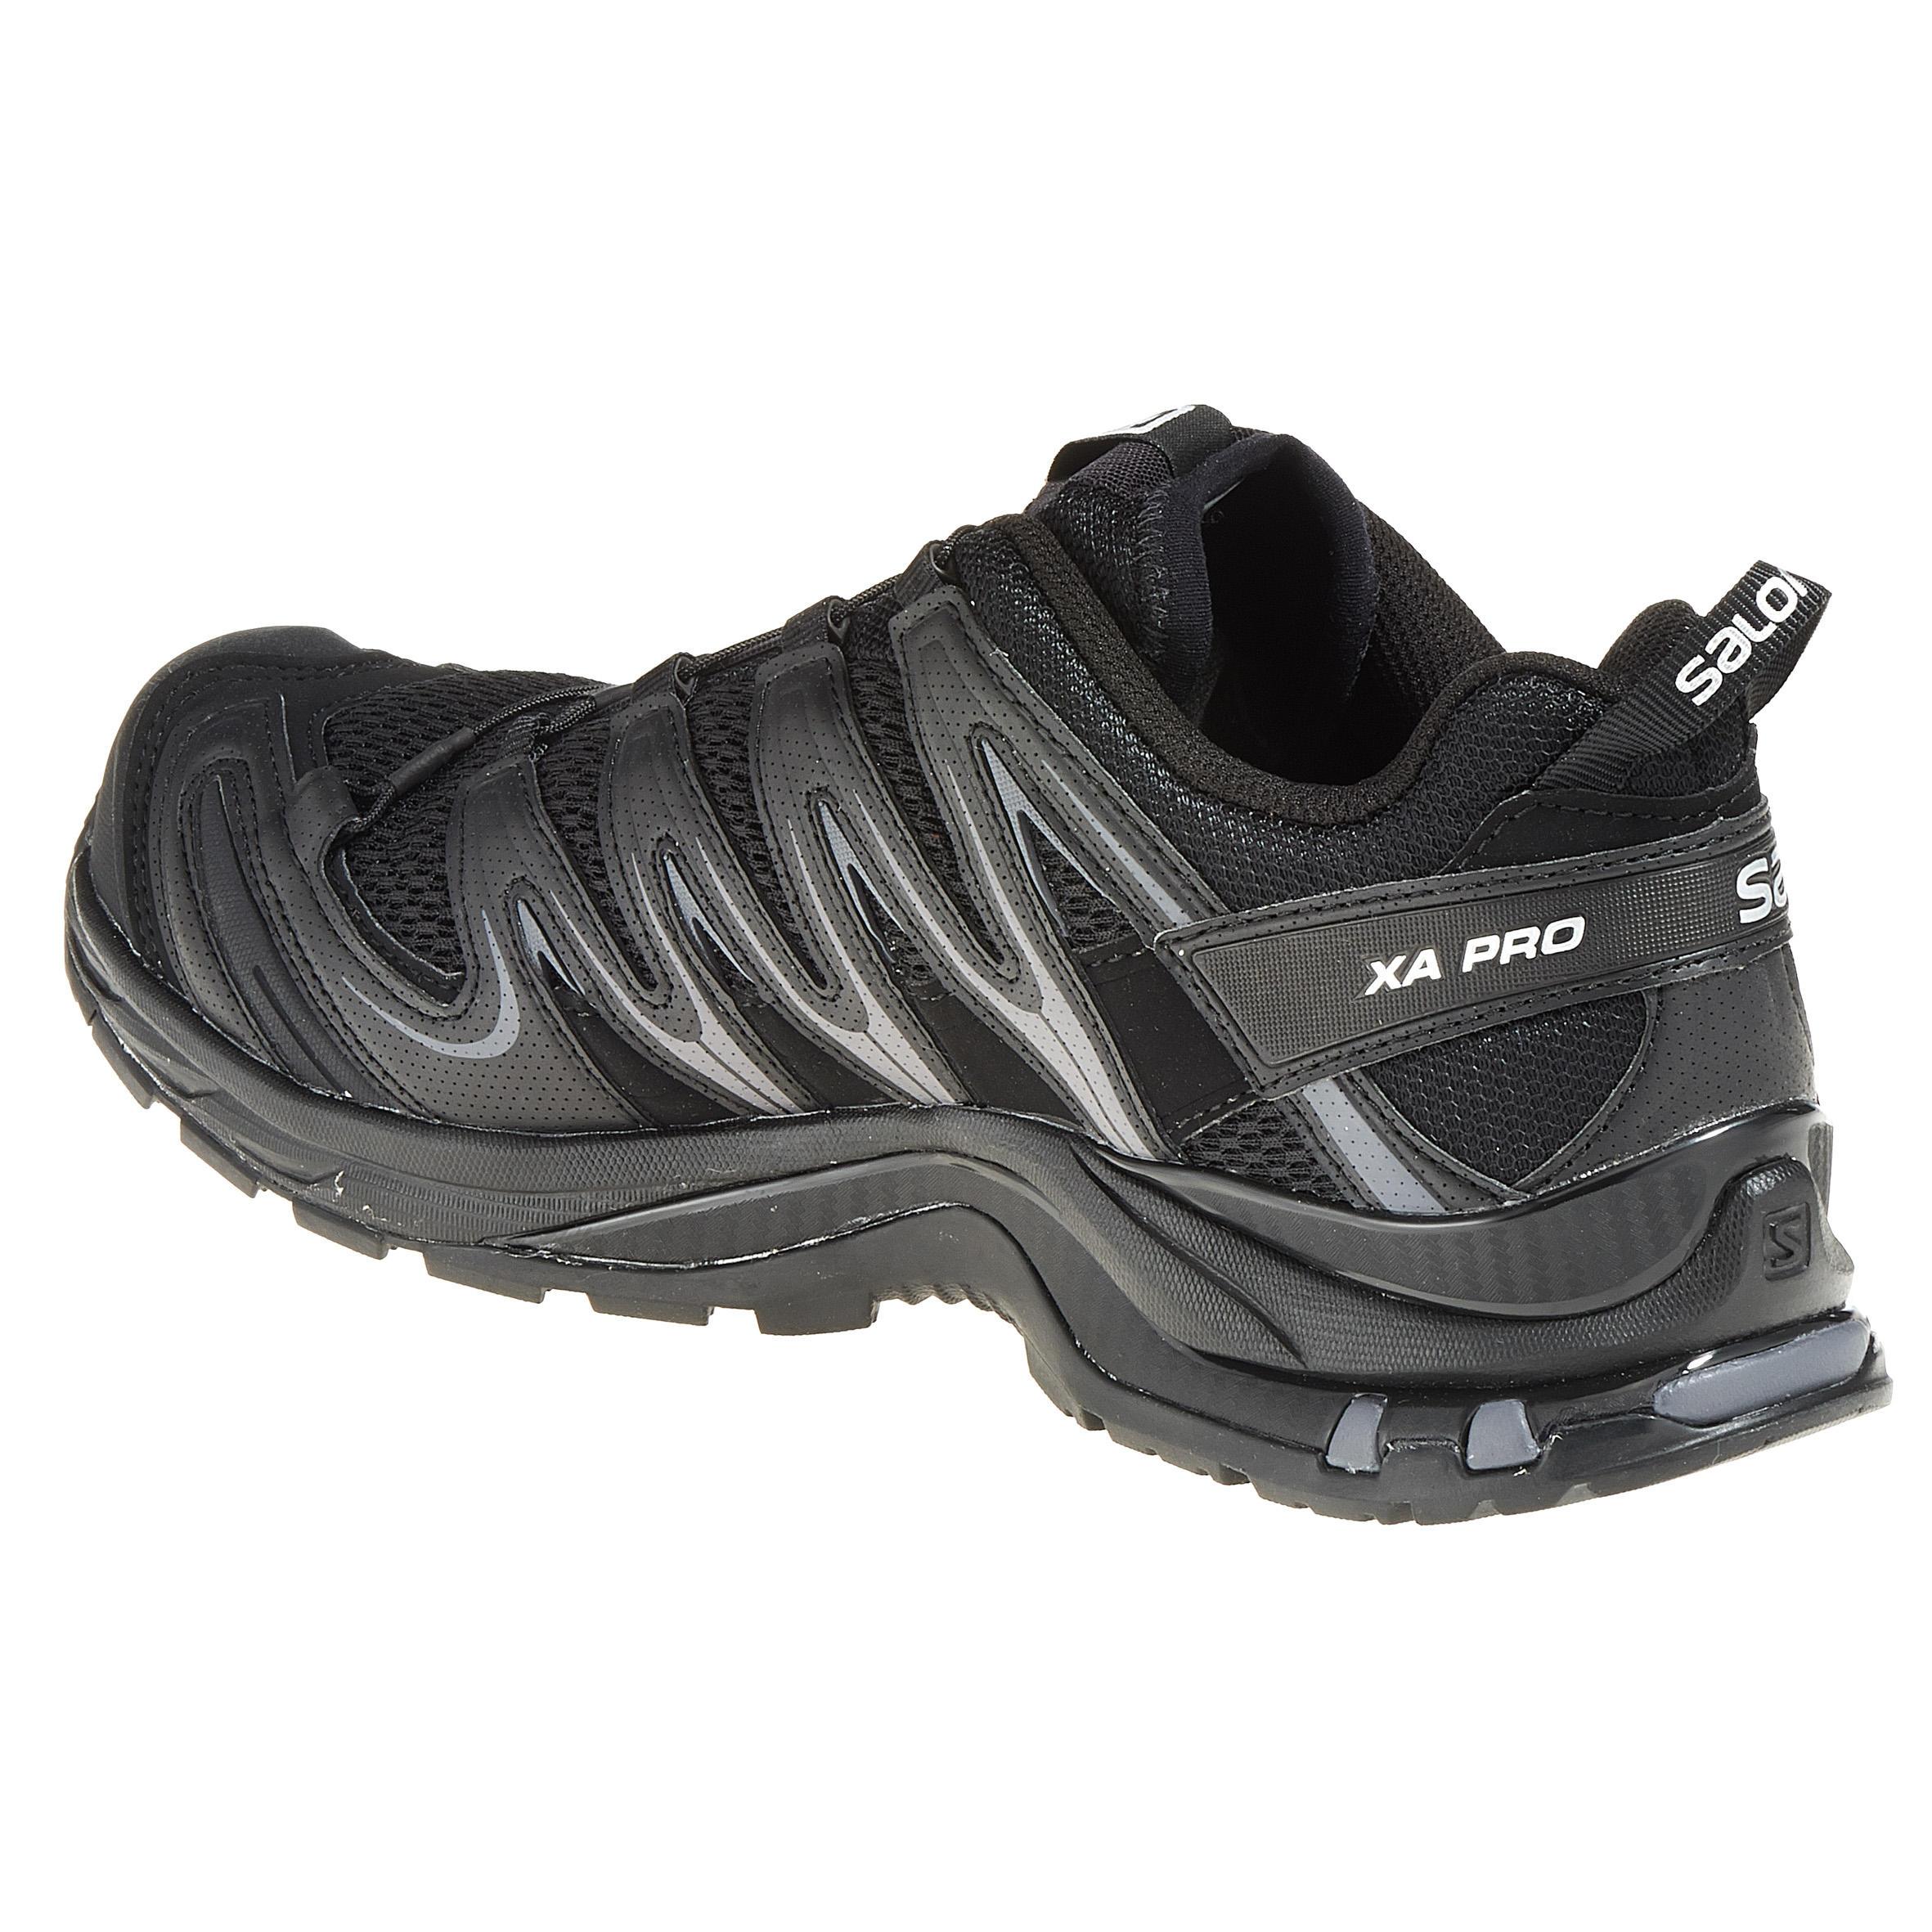 Salomon Noir Pro Chaussure 3d Homme Mountain Trail Xa vN0Omw8n